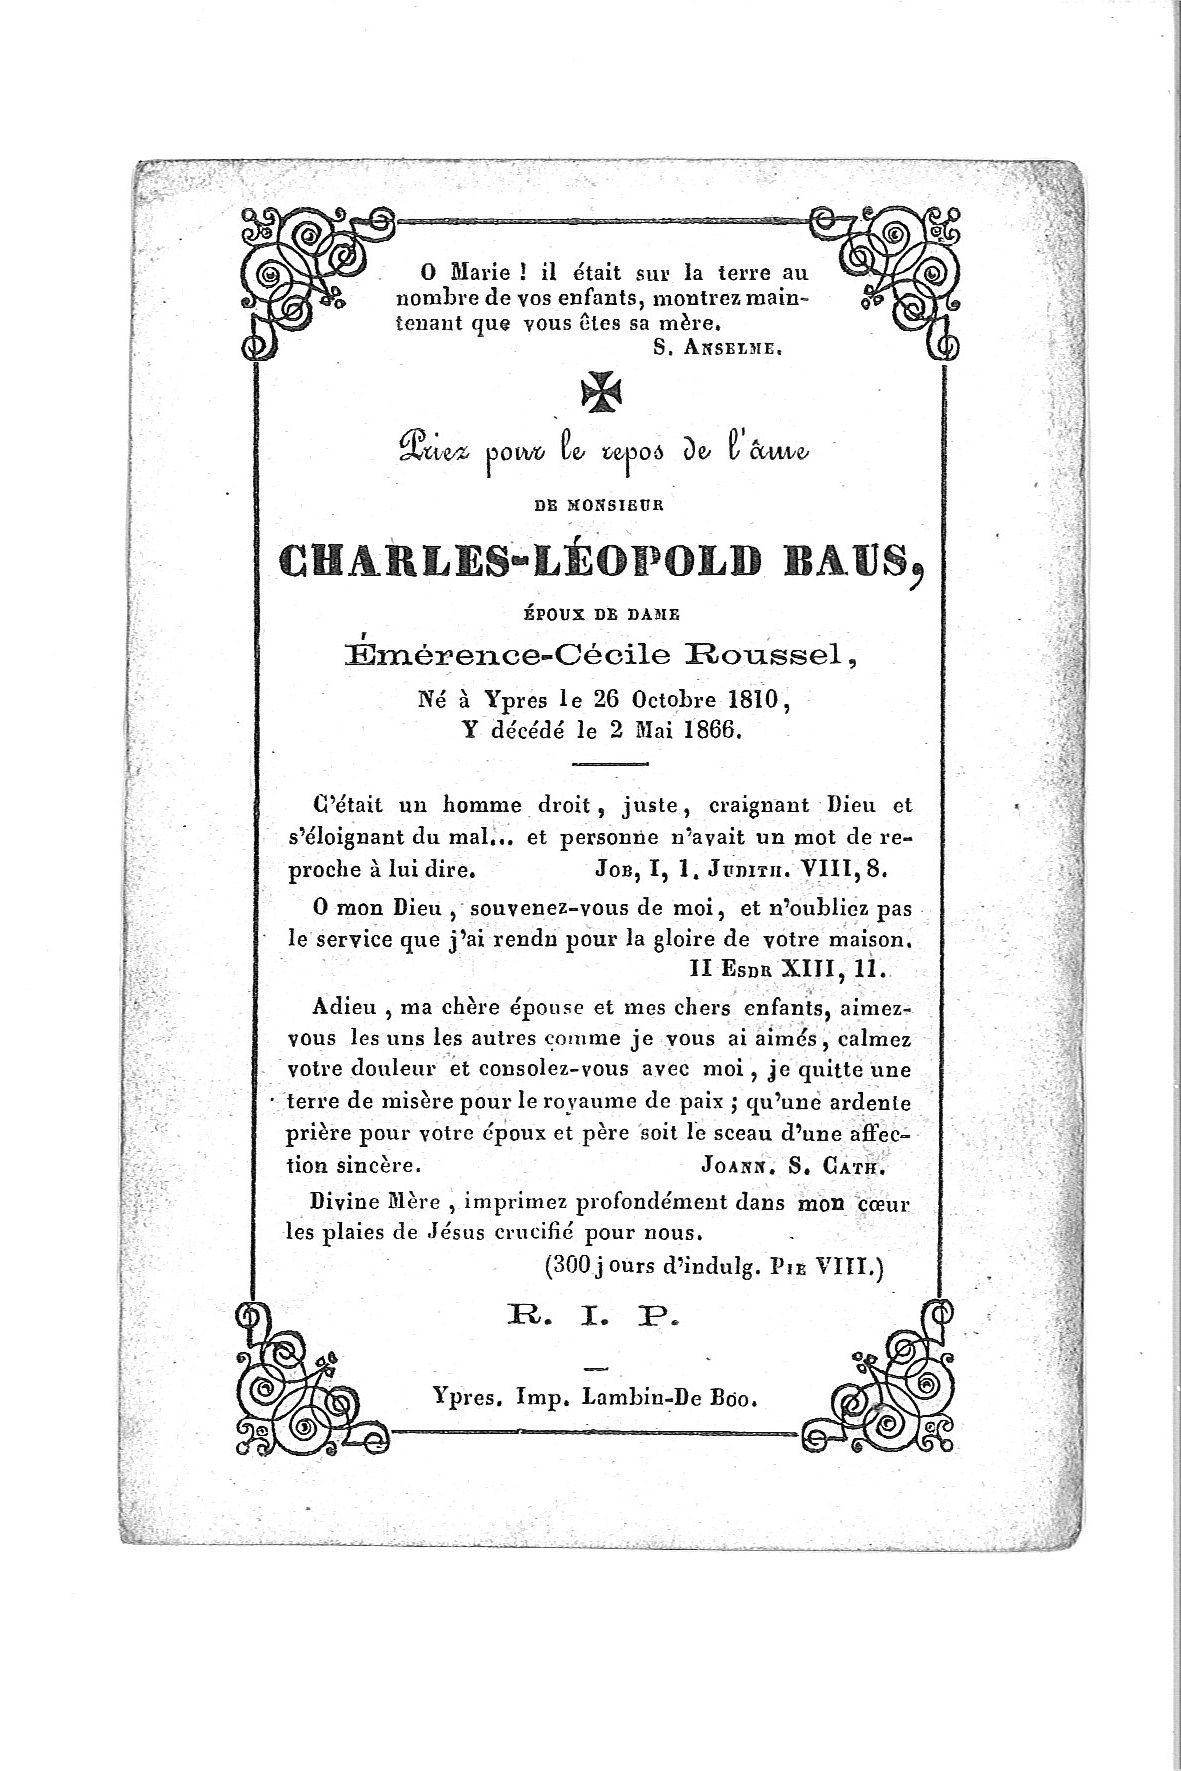 charles-léopold(1866)20090709113558_00028.jpg